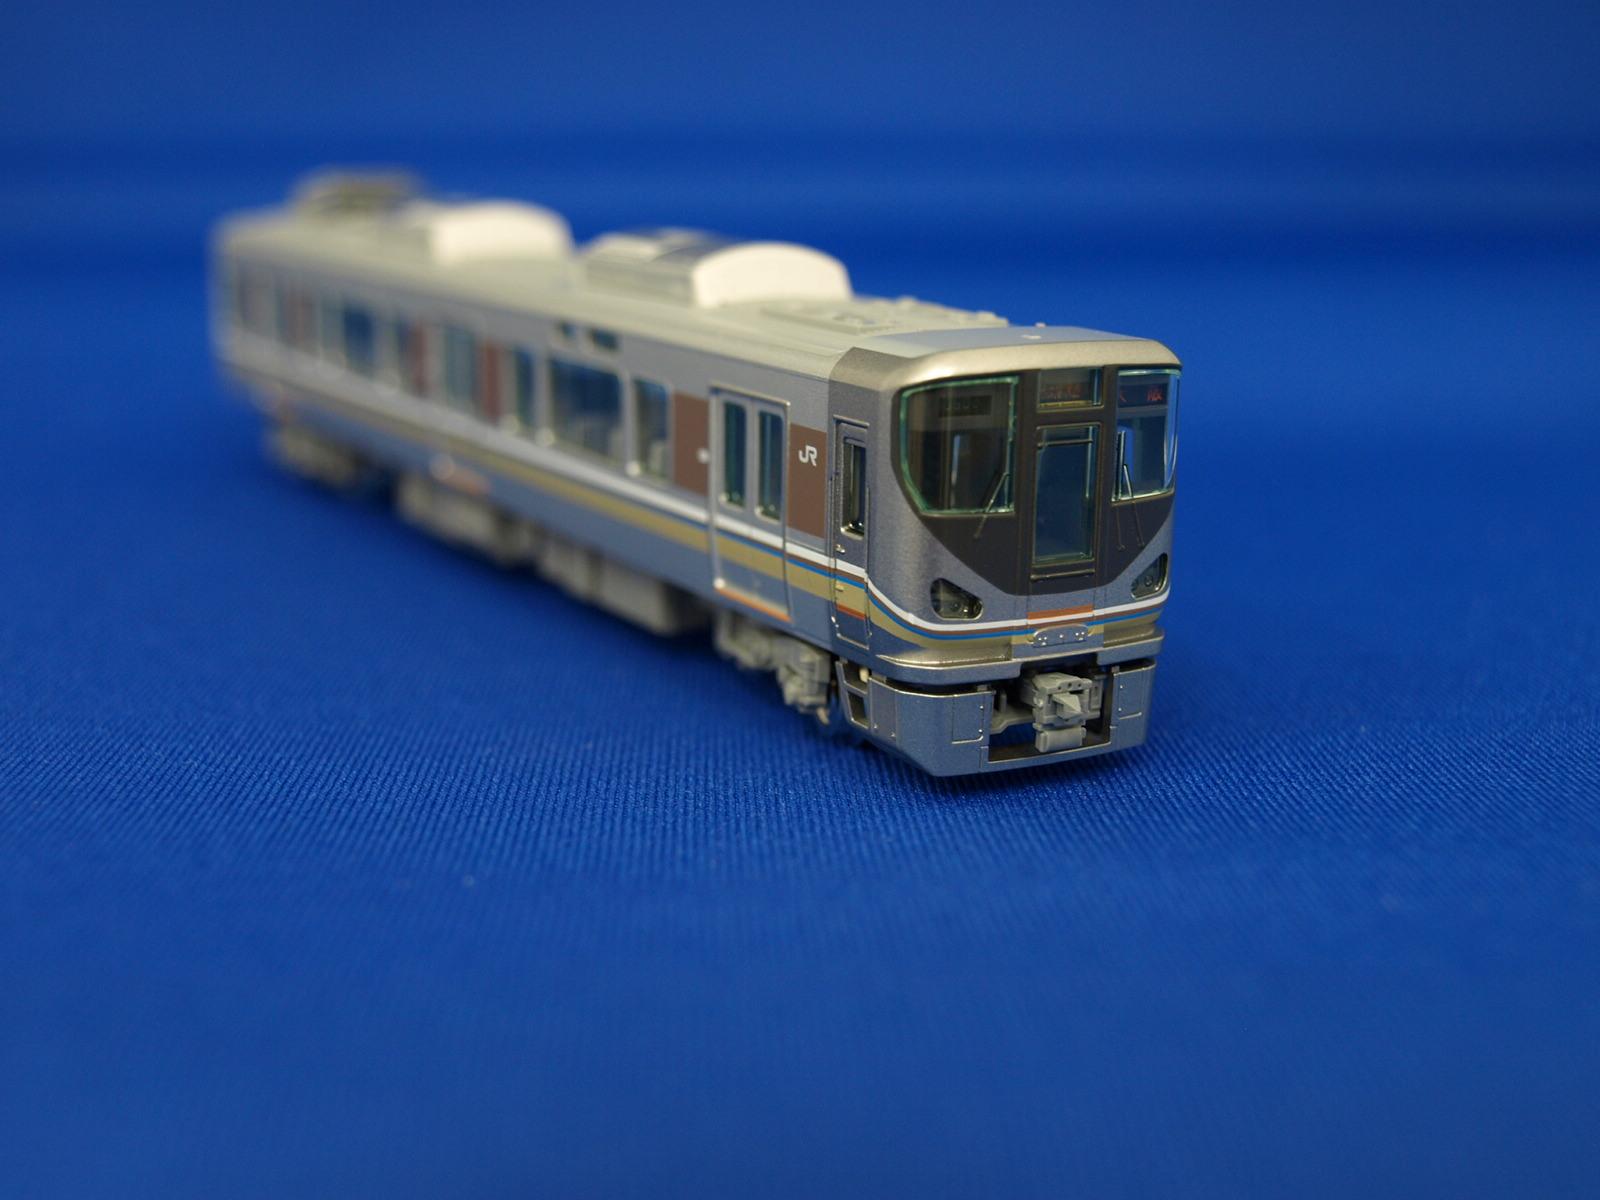 Nゲージ トミックス 98606  JR 225-6000系近郊電車(6両編成)セット